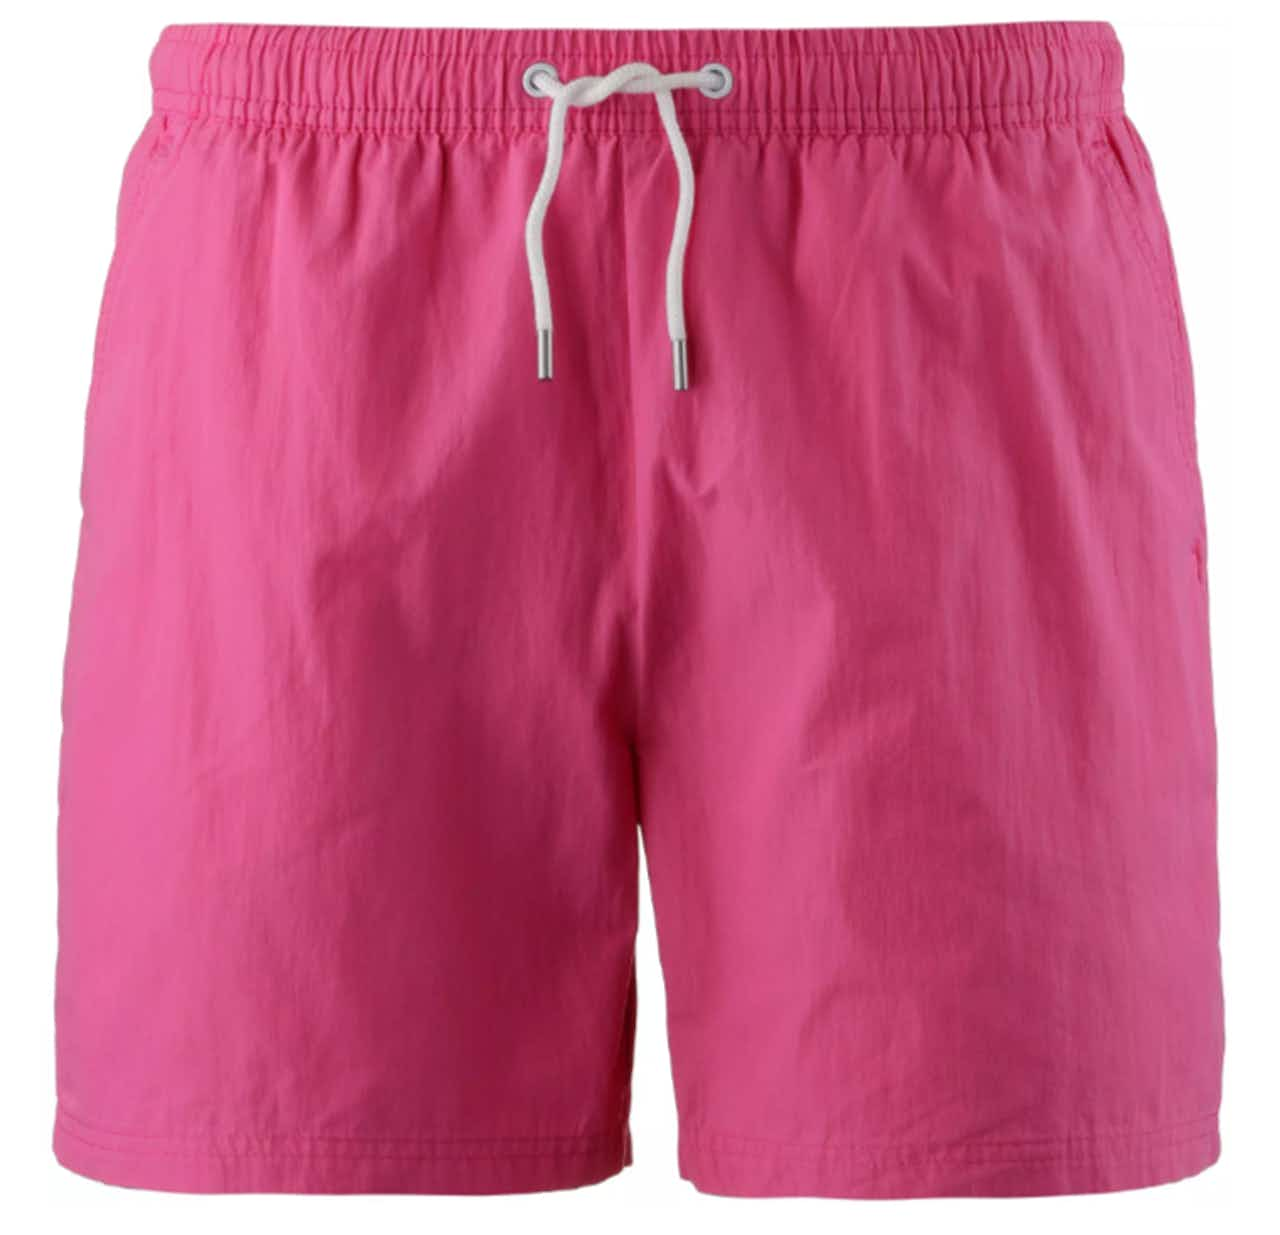 Maui Wowie Badeshorts Herren Pink